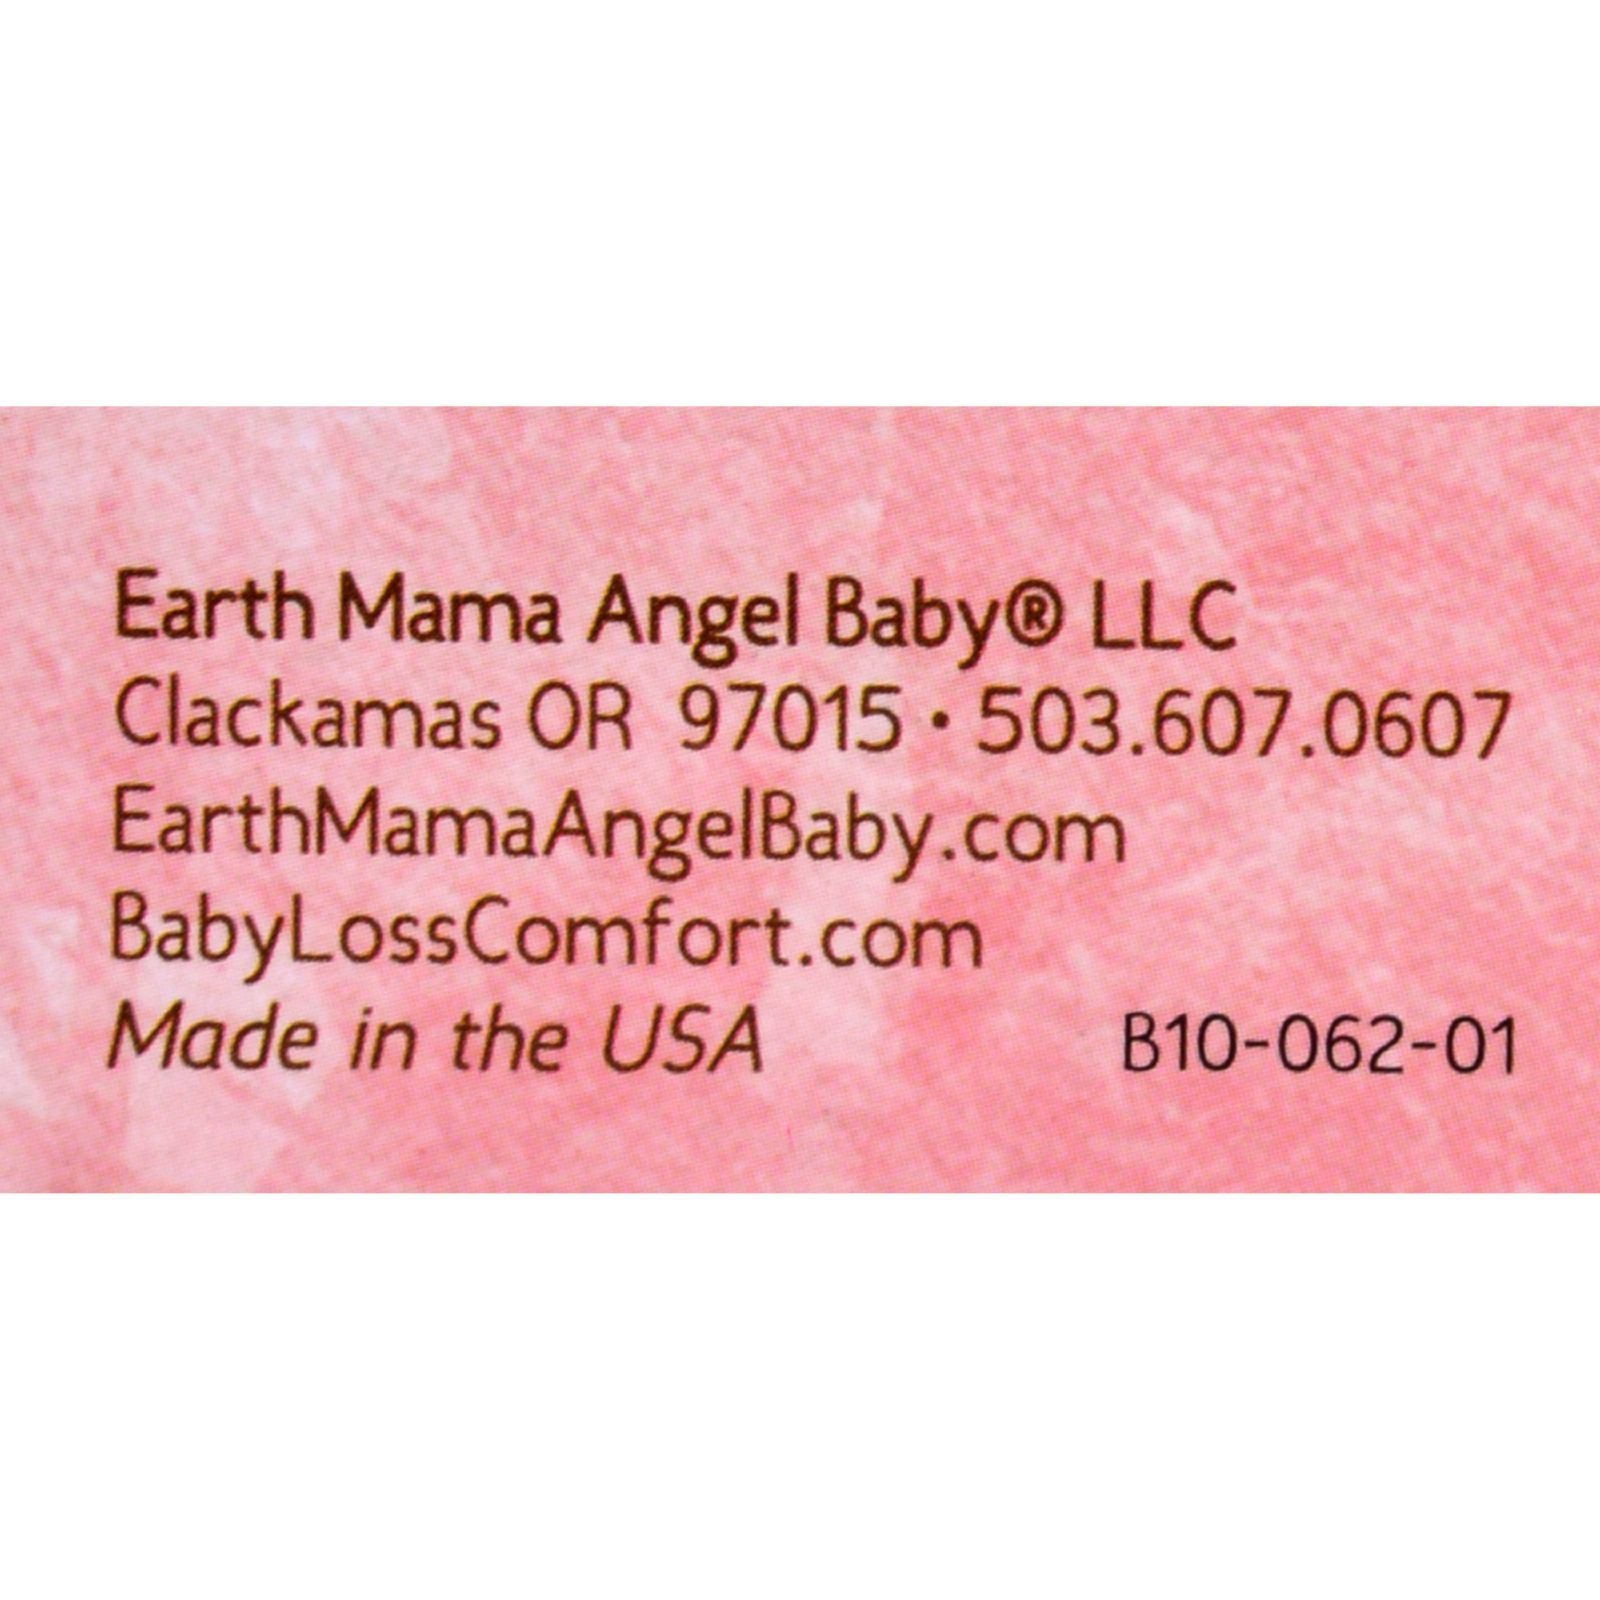 Dropshipping Earth Mama Angel Baby Booby Tubes 2 Tubes